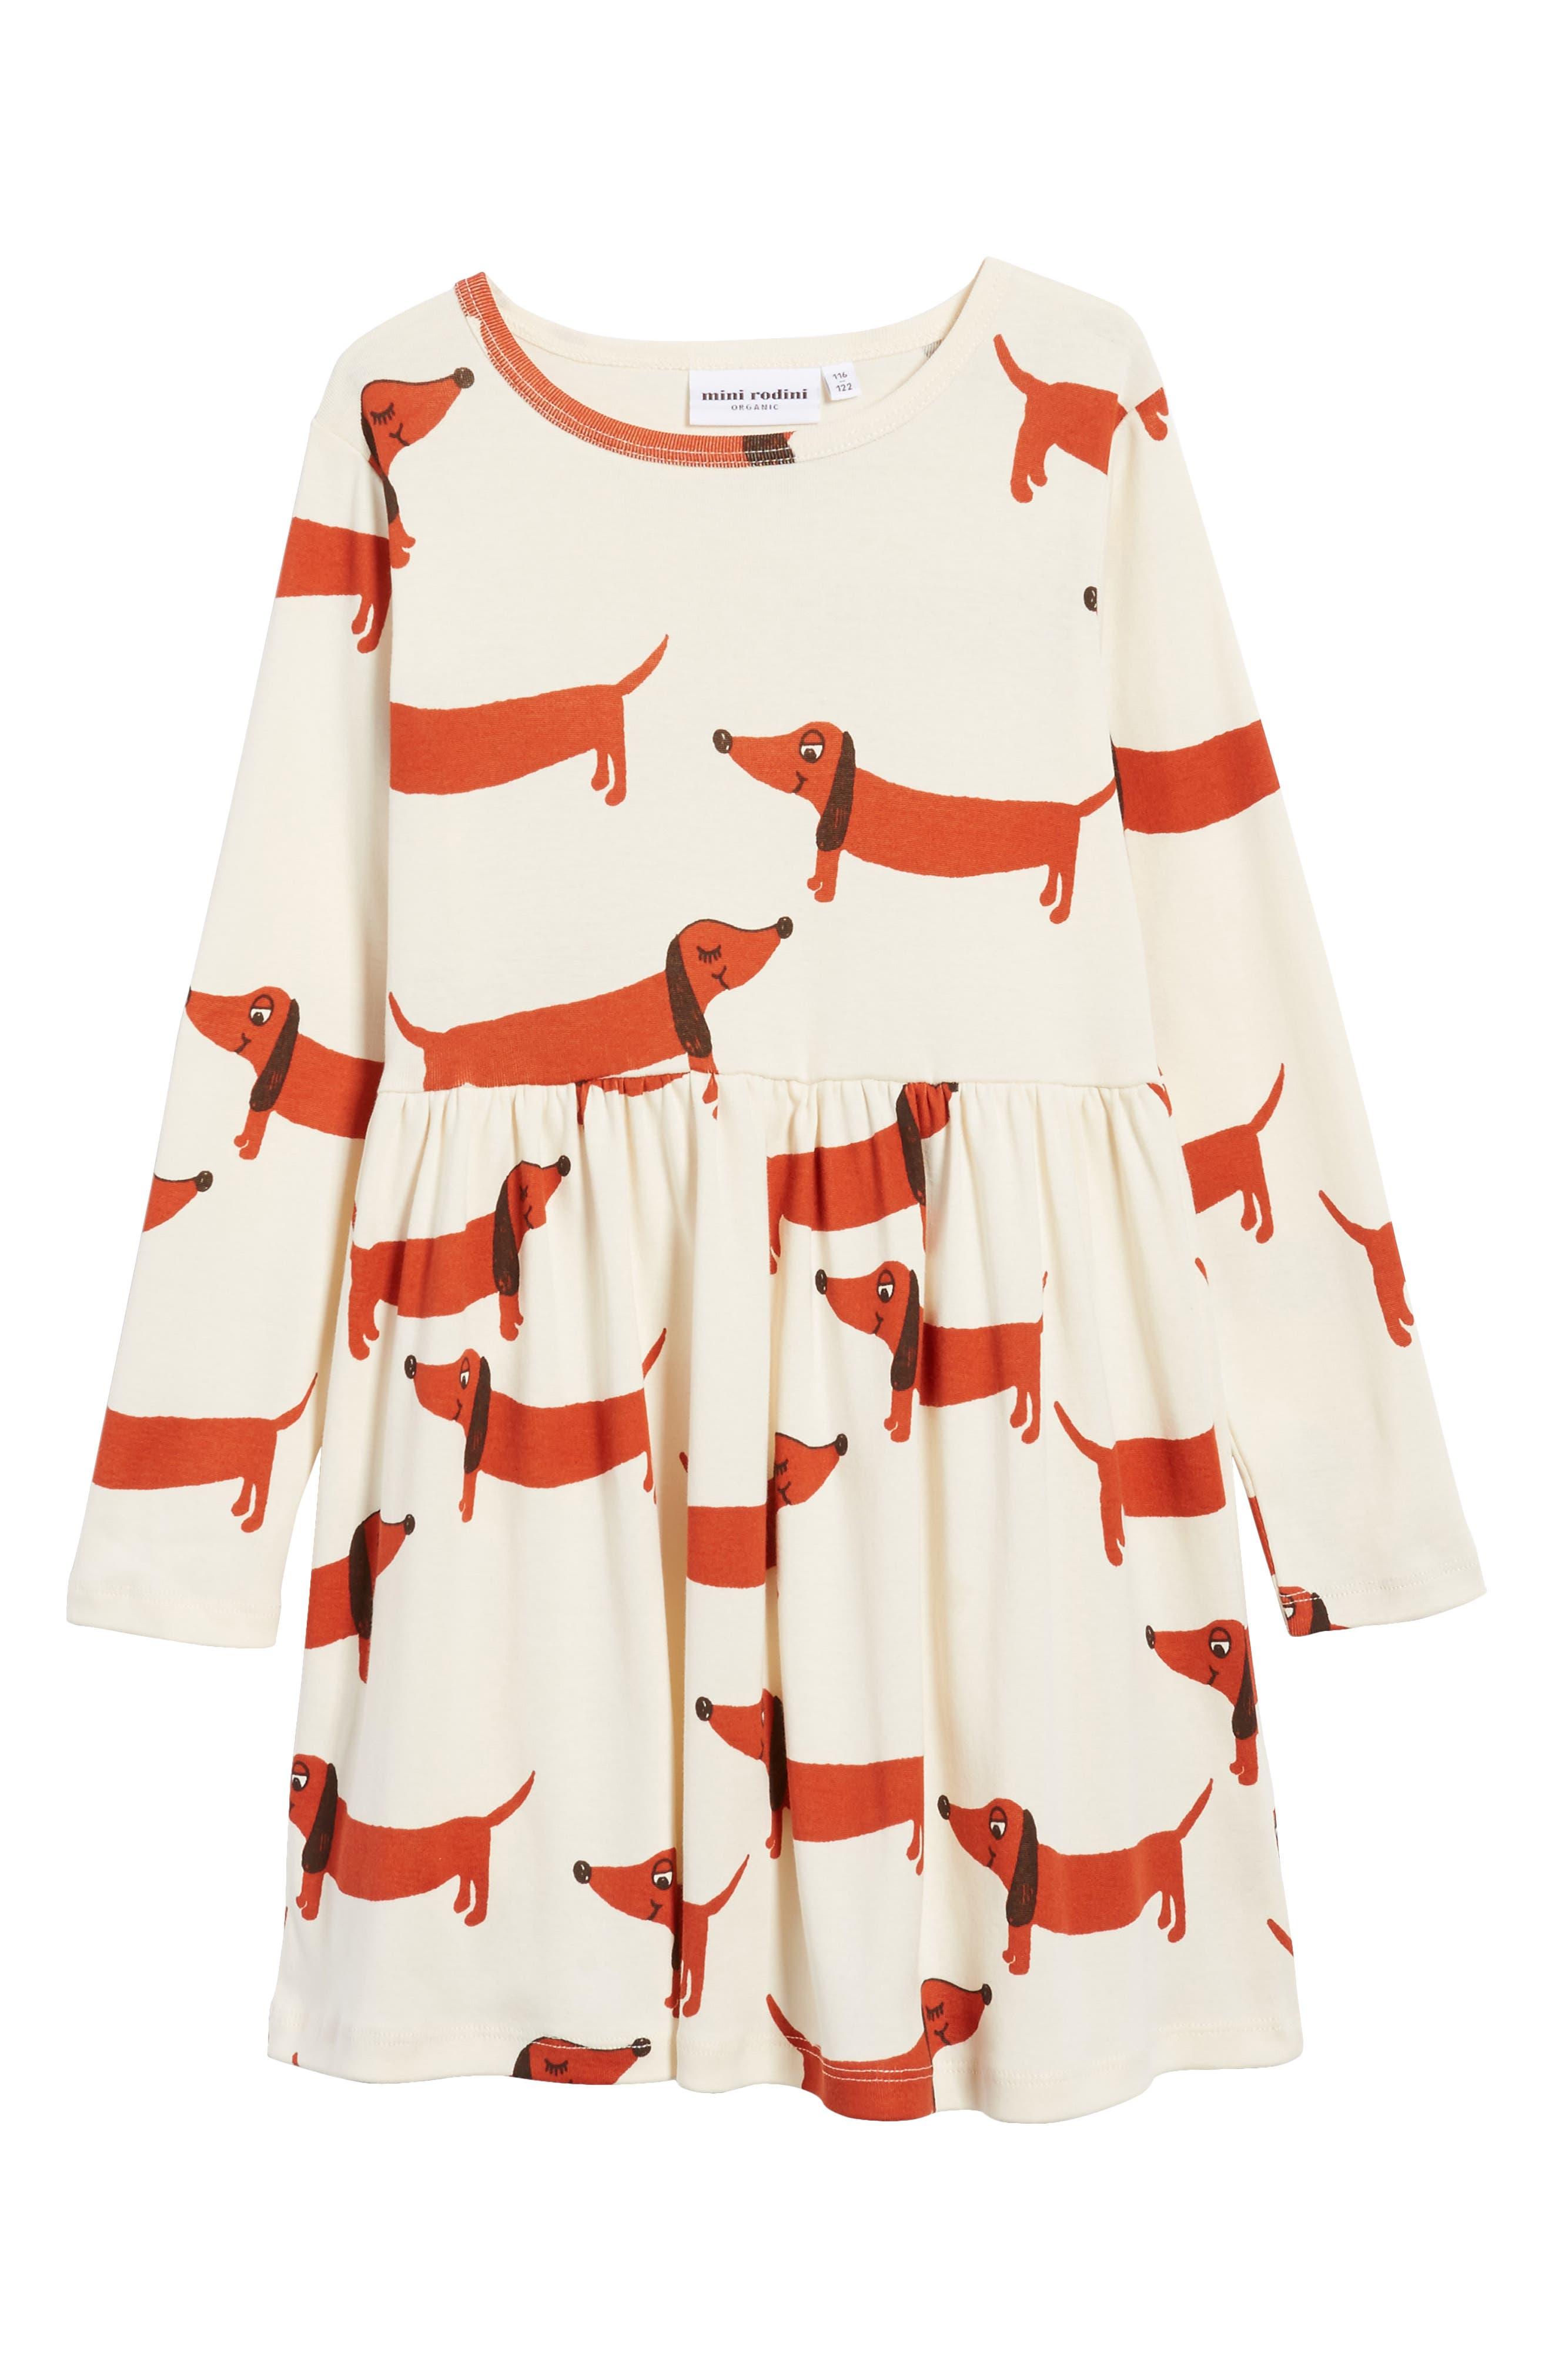 Alternate Image 1 Selected - Mini Rodini Dogs Organic Cotton Dress (Toddler Girls & Little Girls)